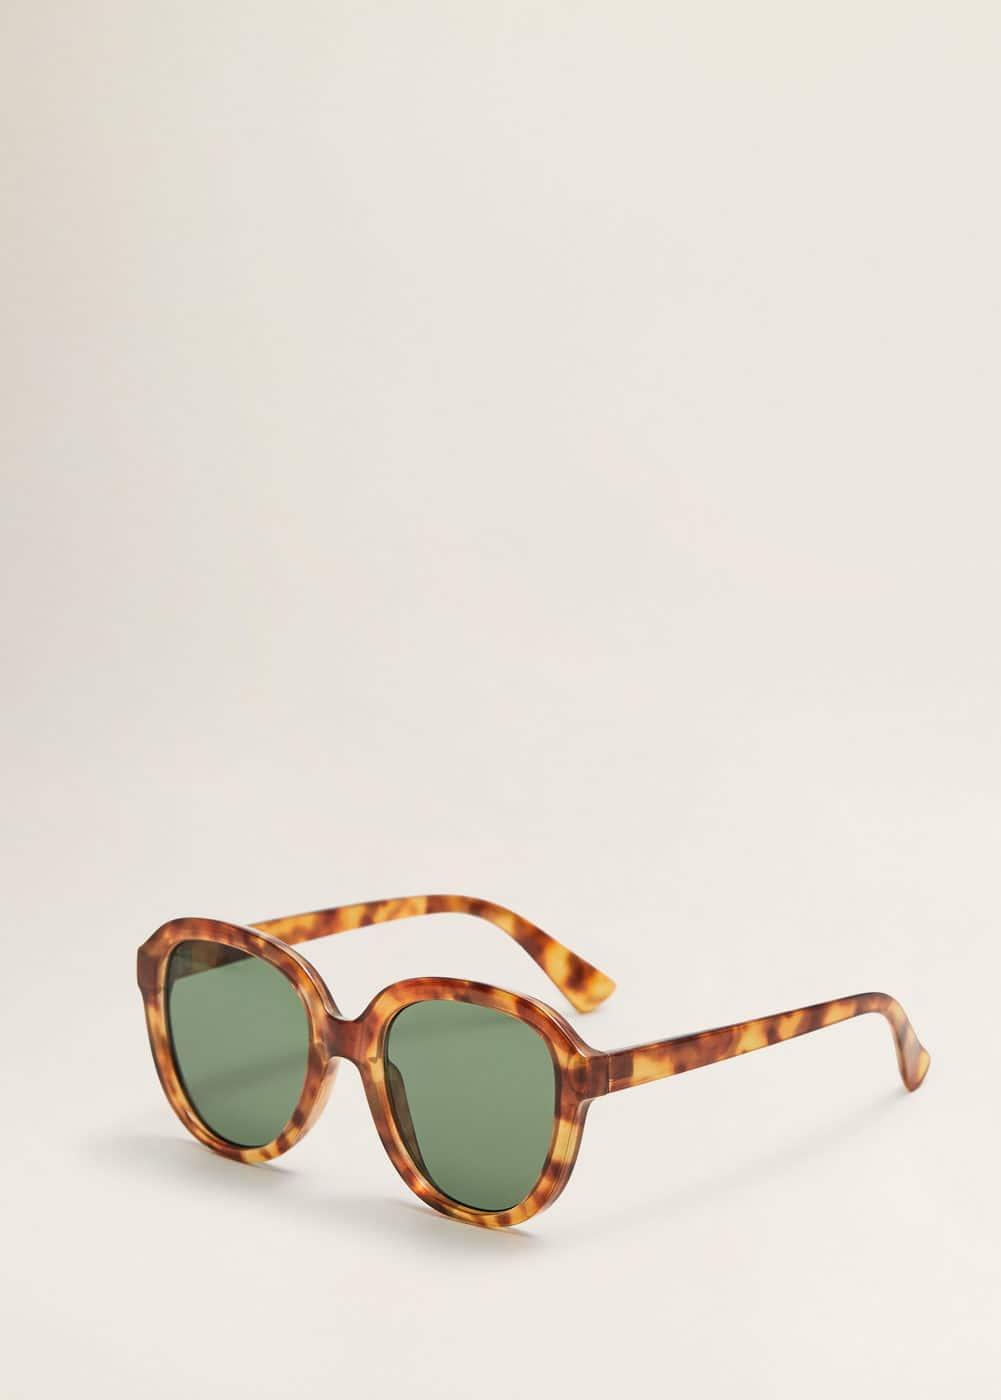 Tortoiseshell Oversize Sunglasses by Mango